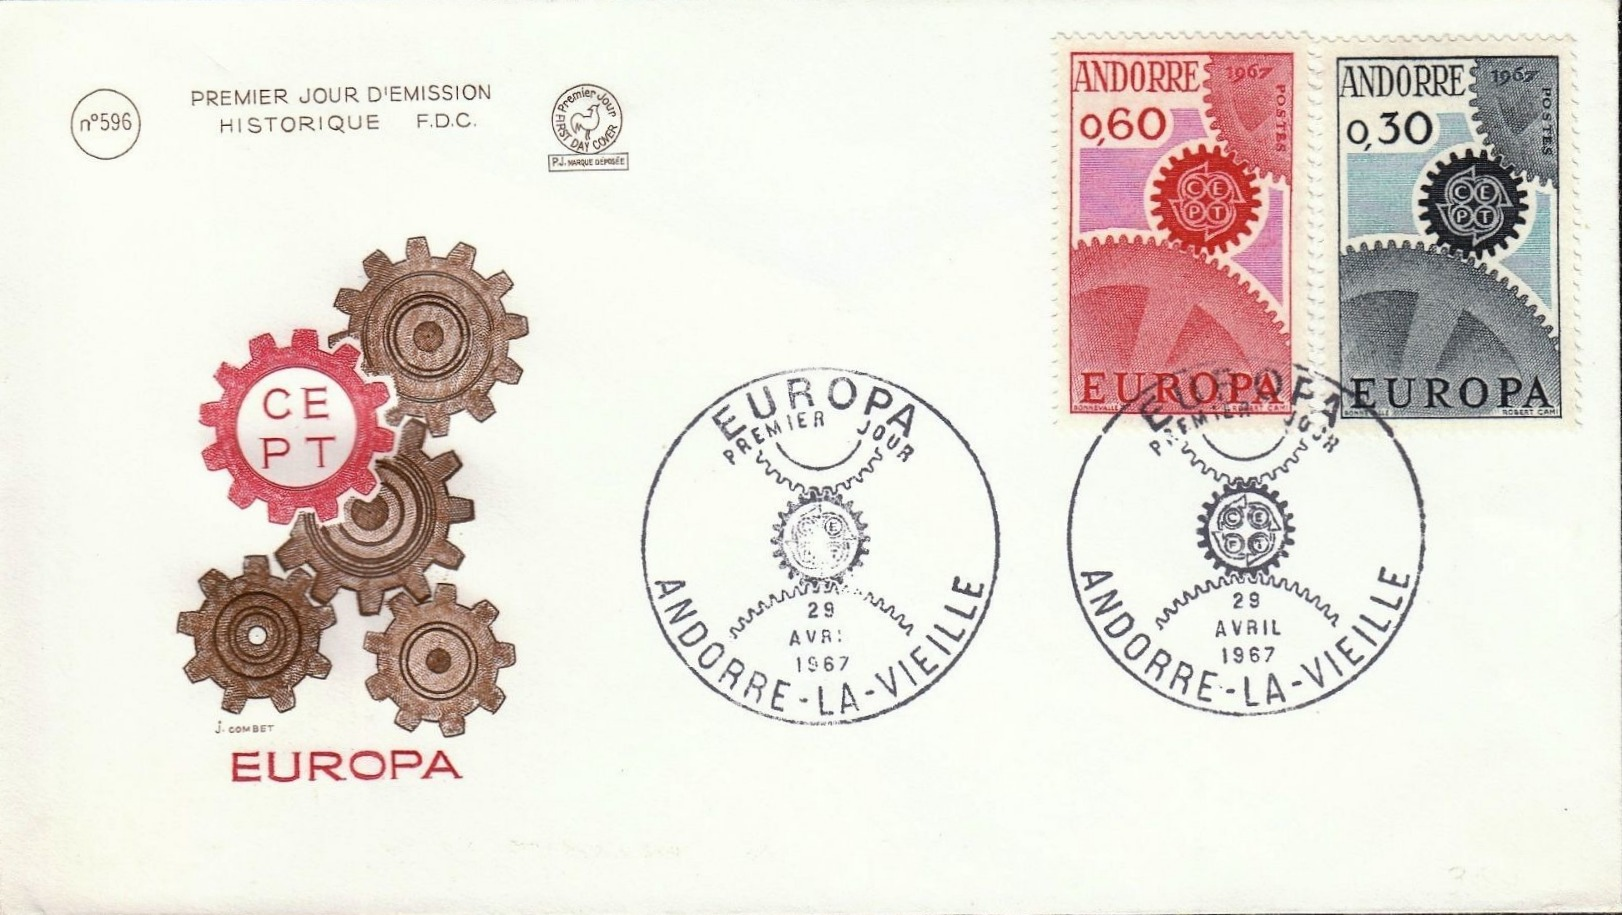 Andorra-French 1967 Europa FDCe.jpg